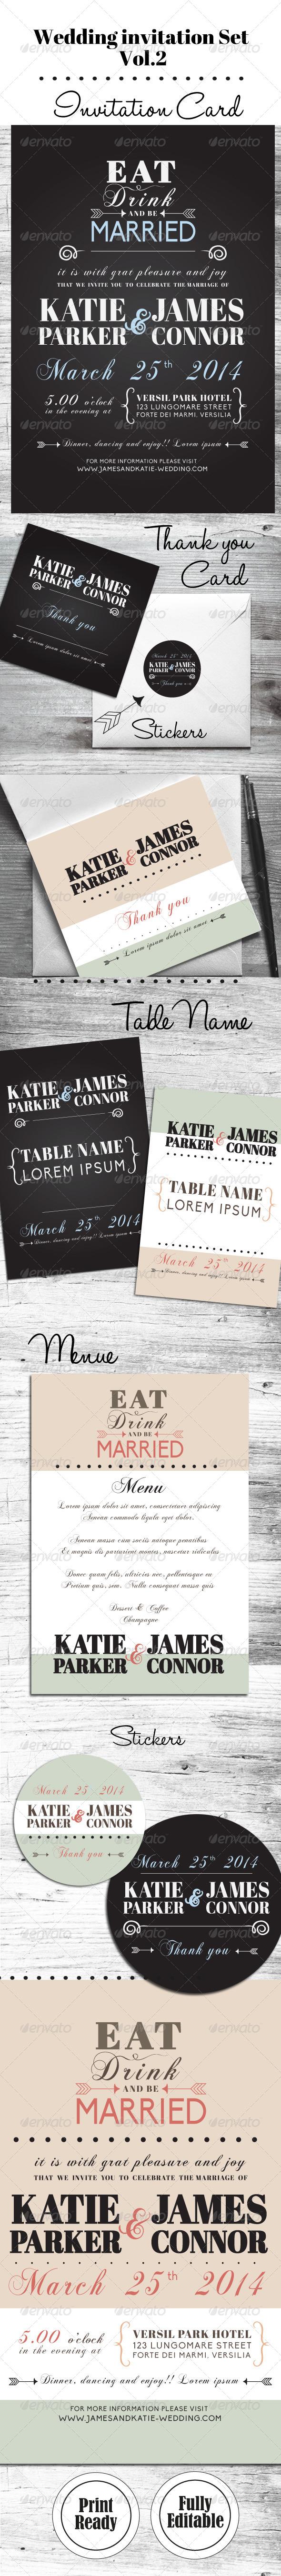 Wedding Invitation Set Vol. 02 - Weddings Cards & Invites